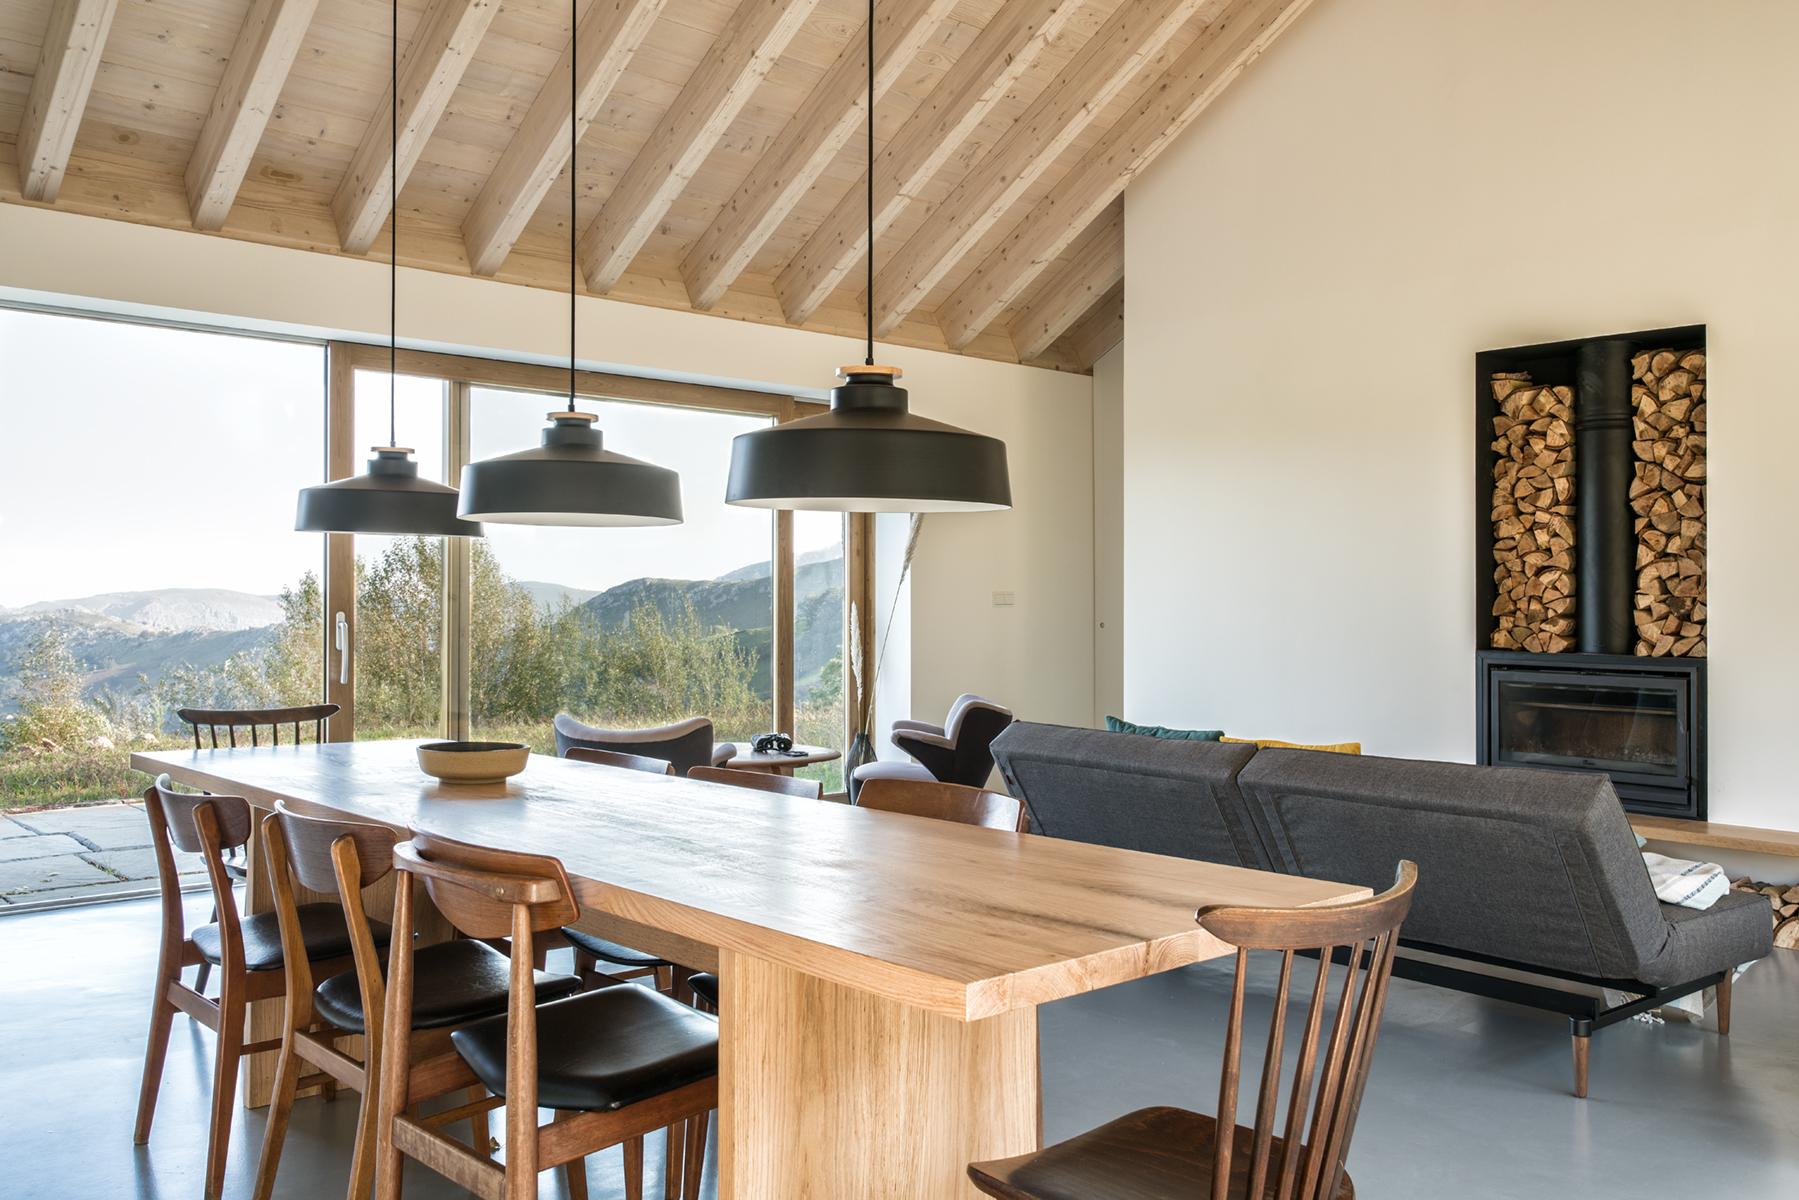 Villa slow holiday retreat by laura alvarez architecture casalibrary